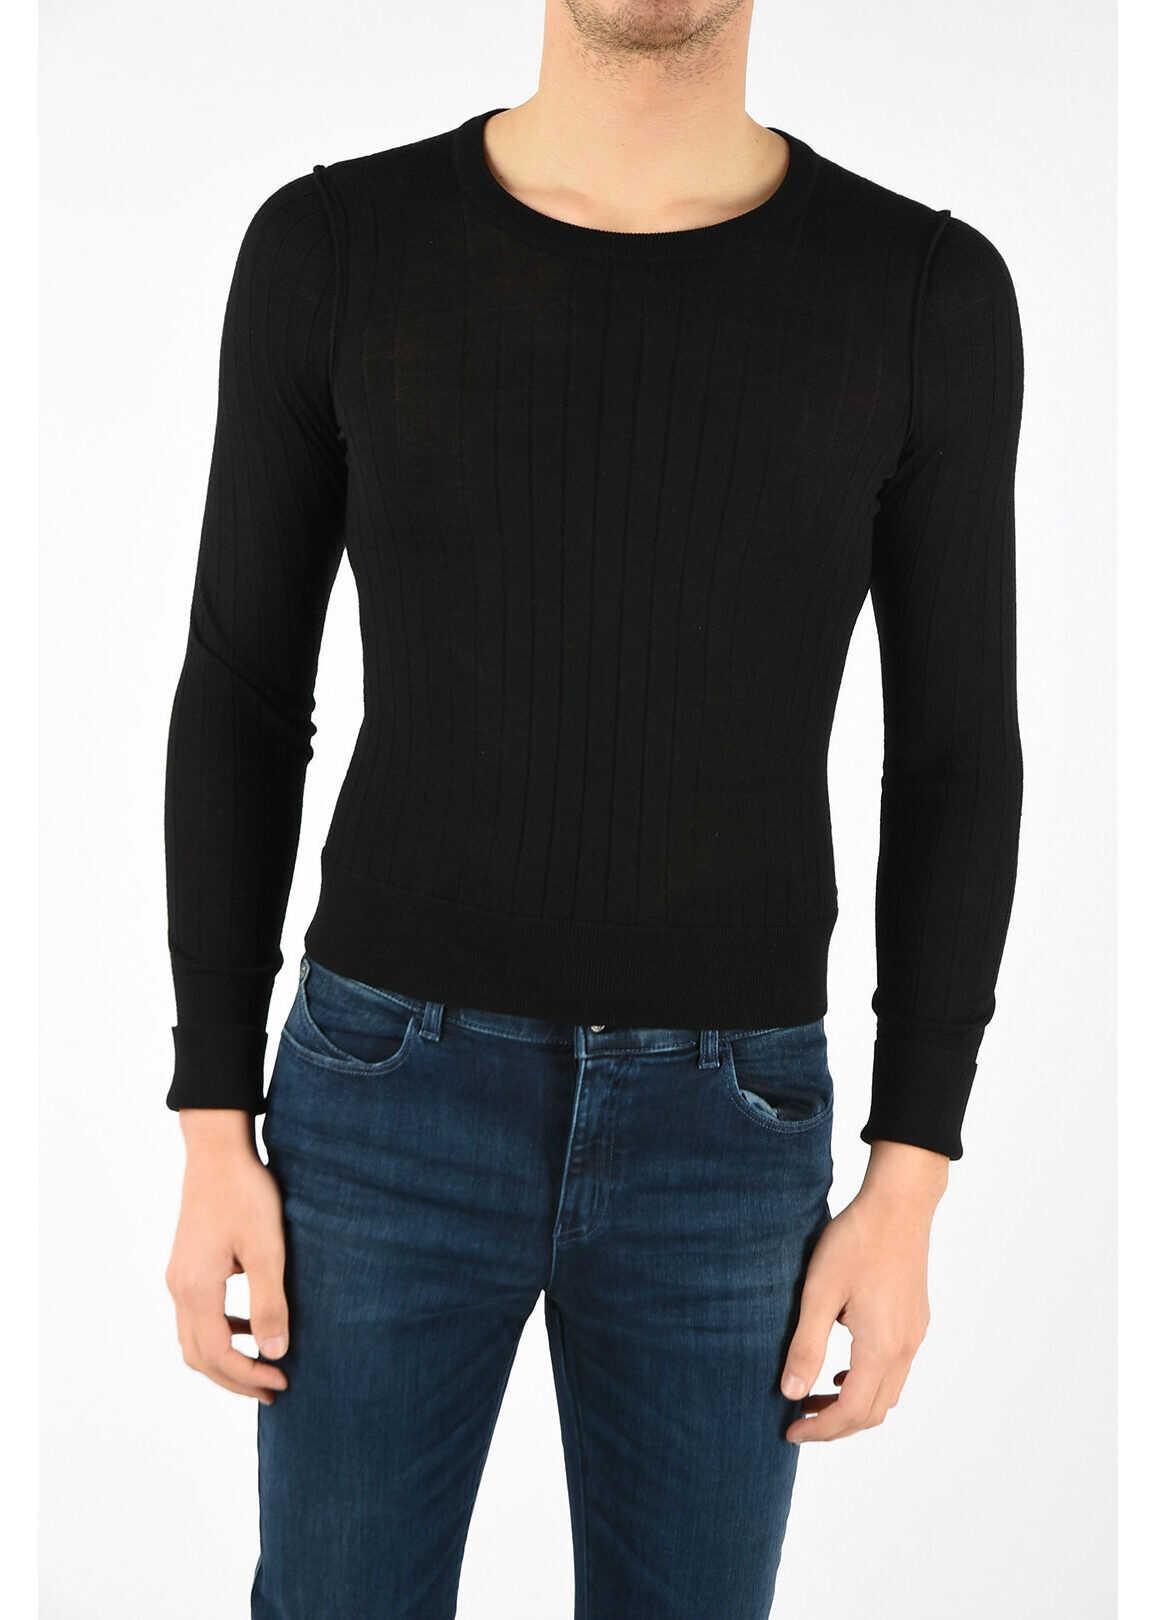 Neil Barrett Ribbed Light Sweater BLACK